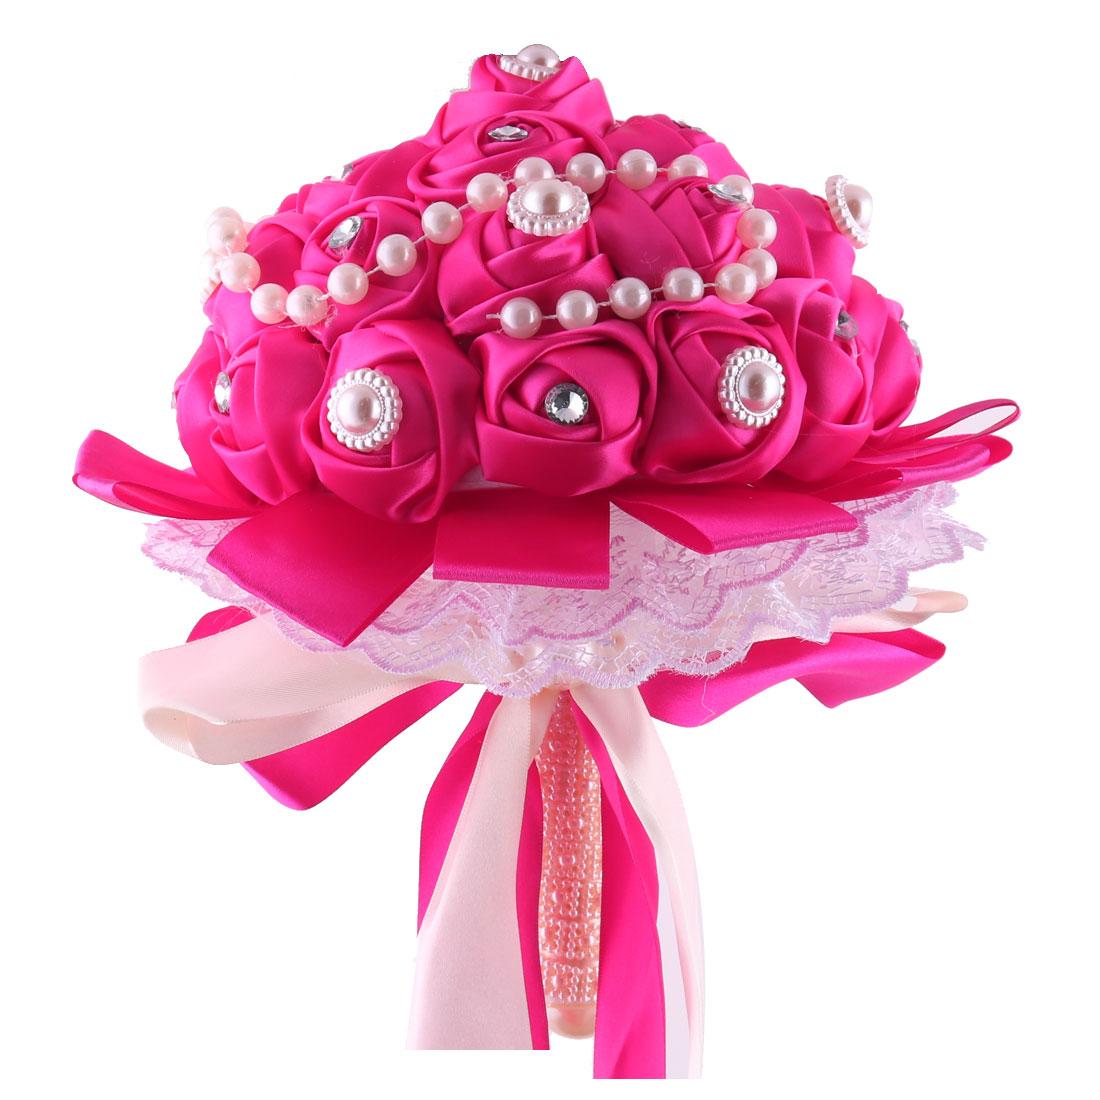 Wedding Bridesmaid Polyester Bowknot Decor Flower Handhold Bouquet Fuchsia 9 Inch Dia